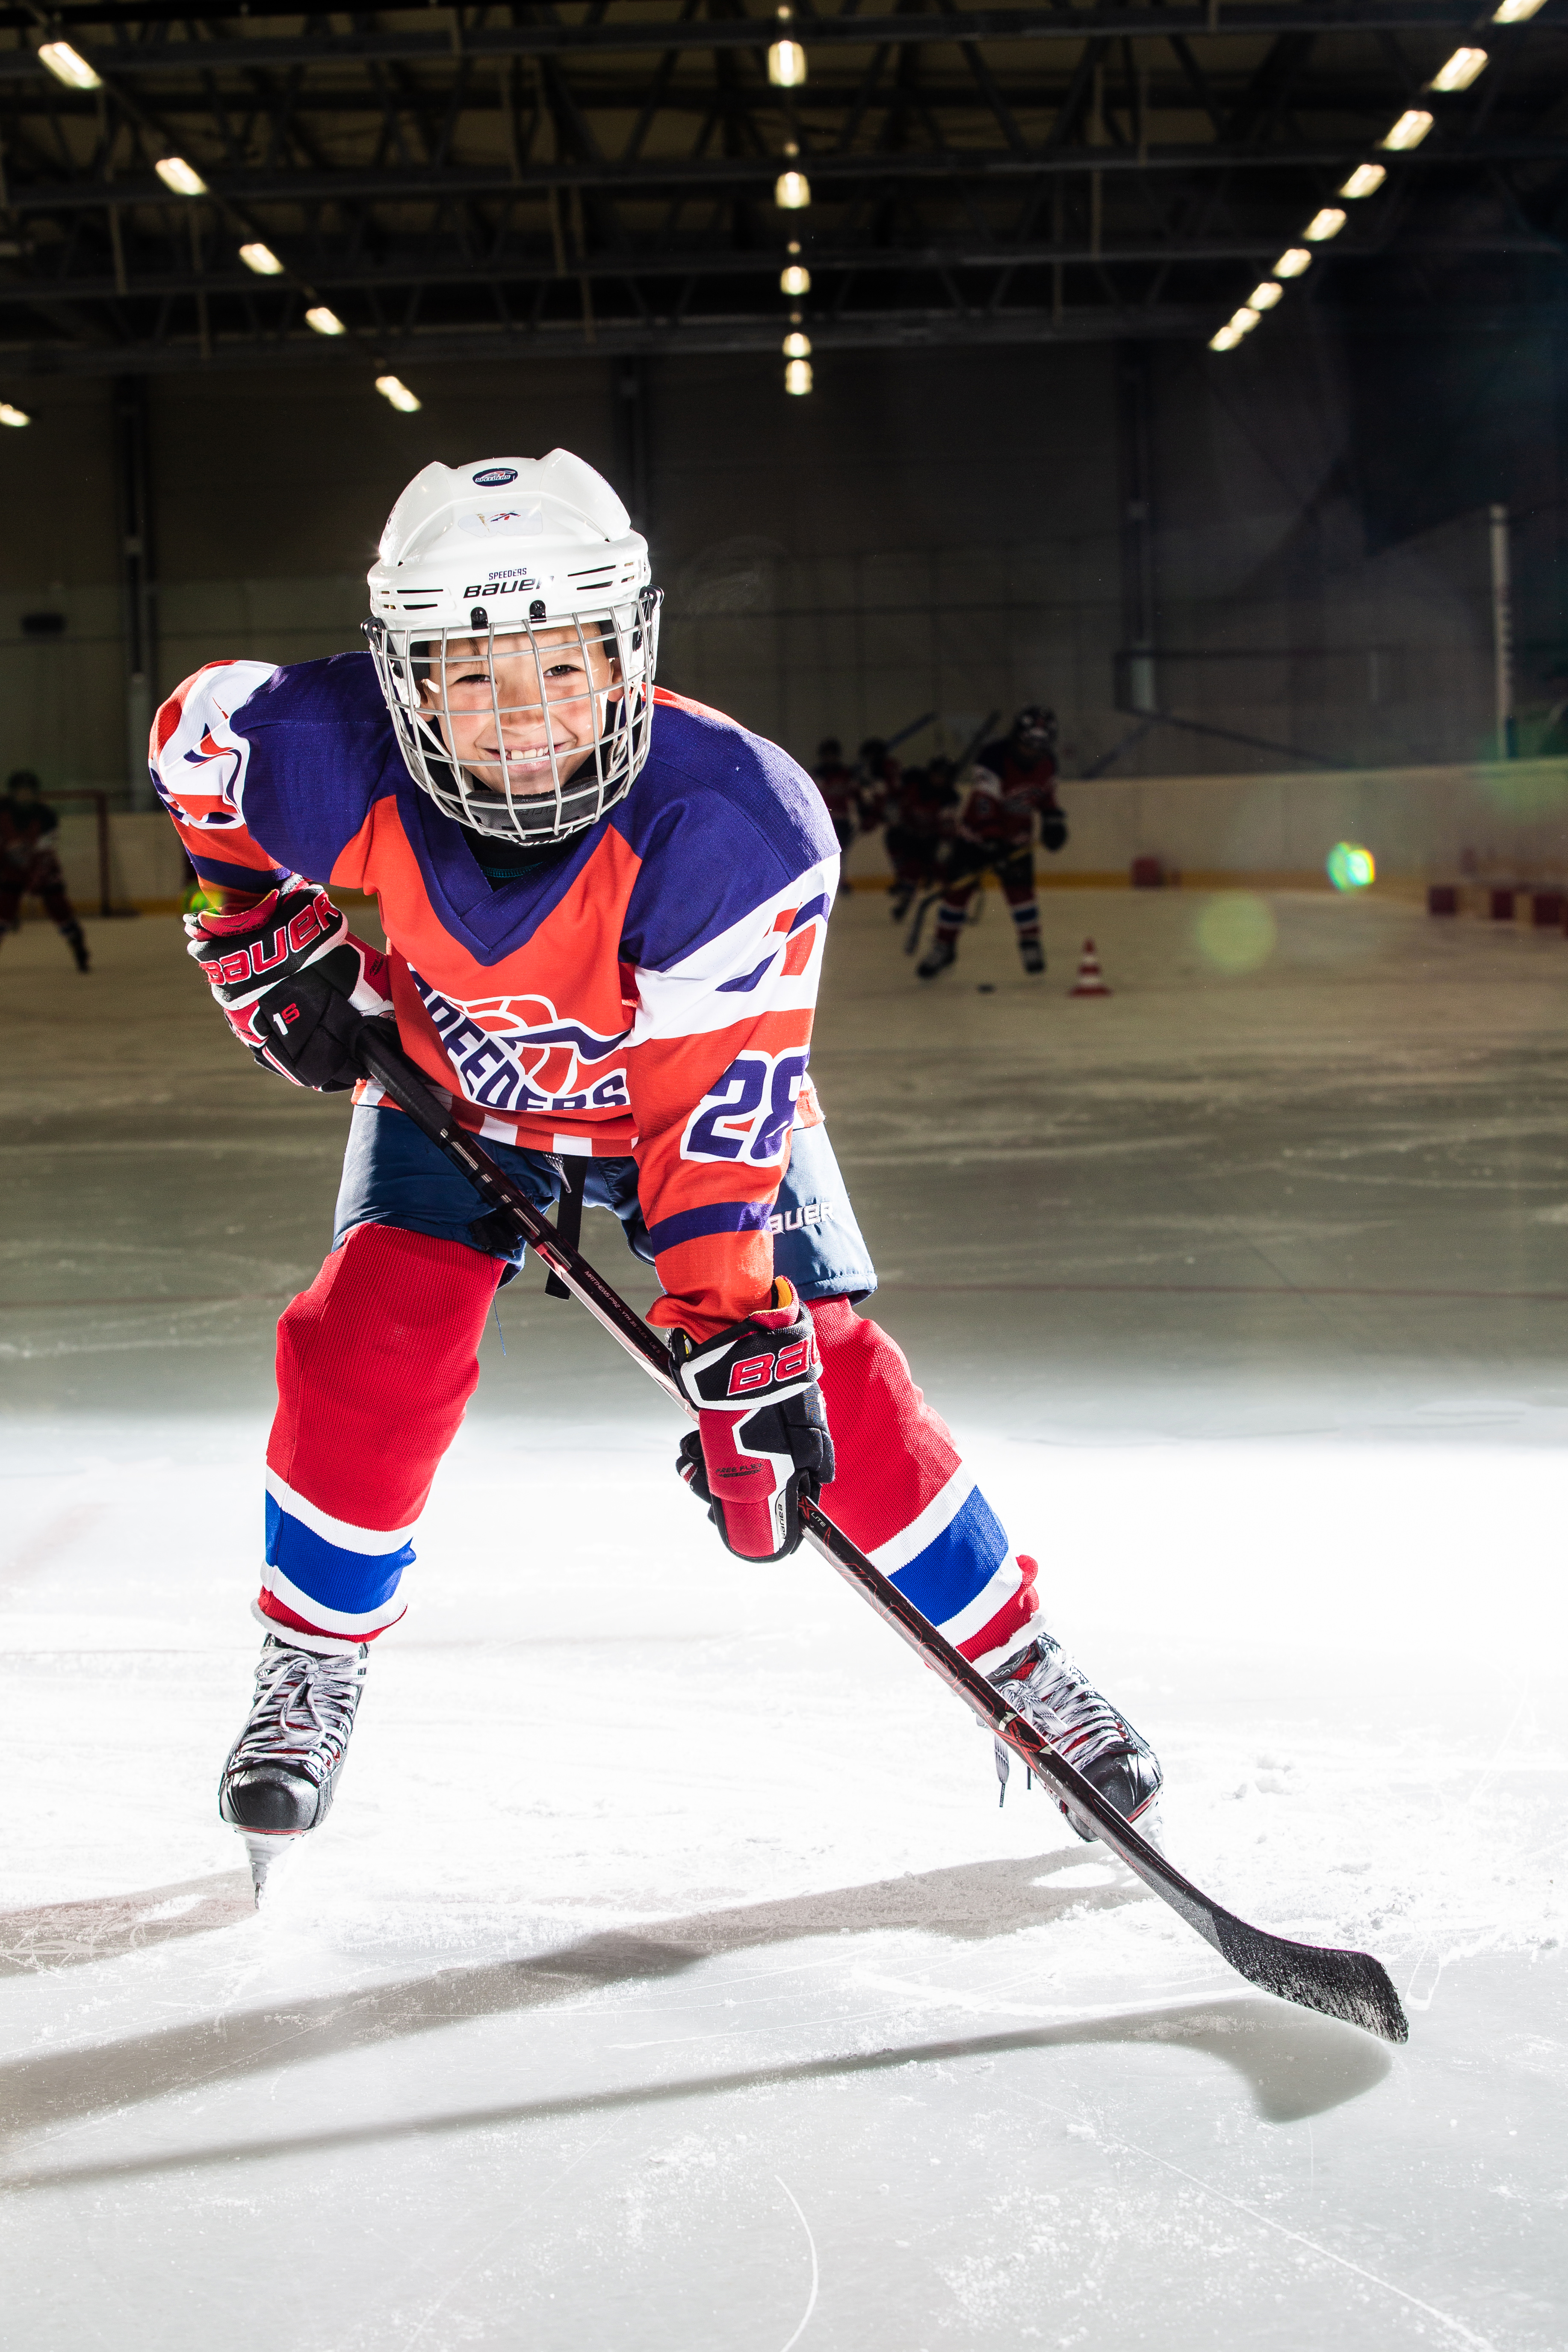 Kristian Hrabovsky Speeders Bratislava cislo 28 hokej